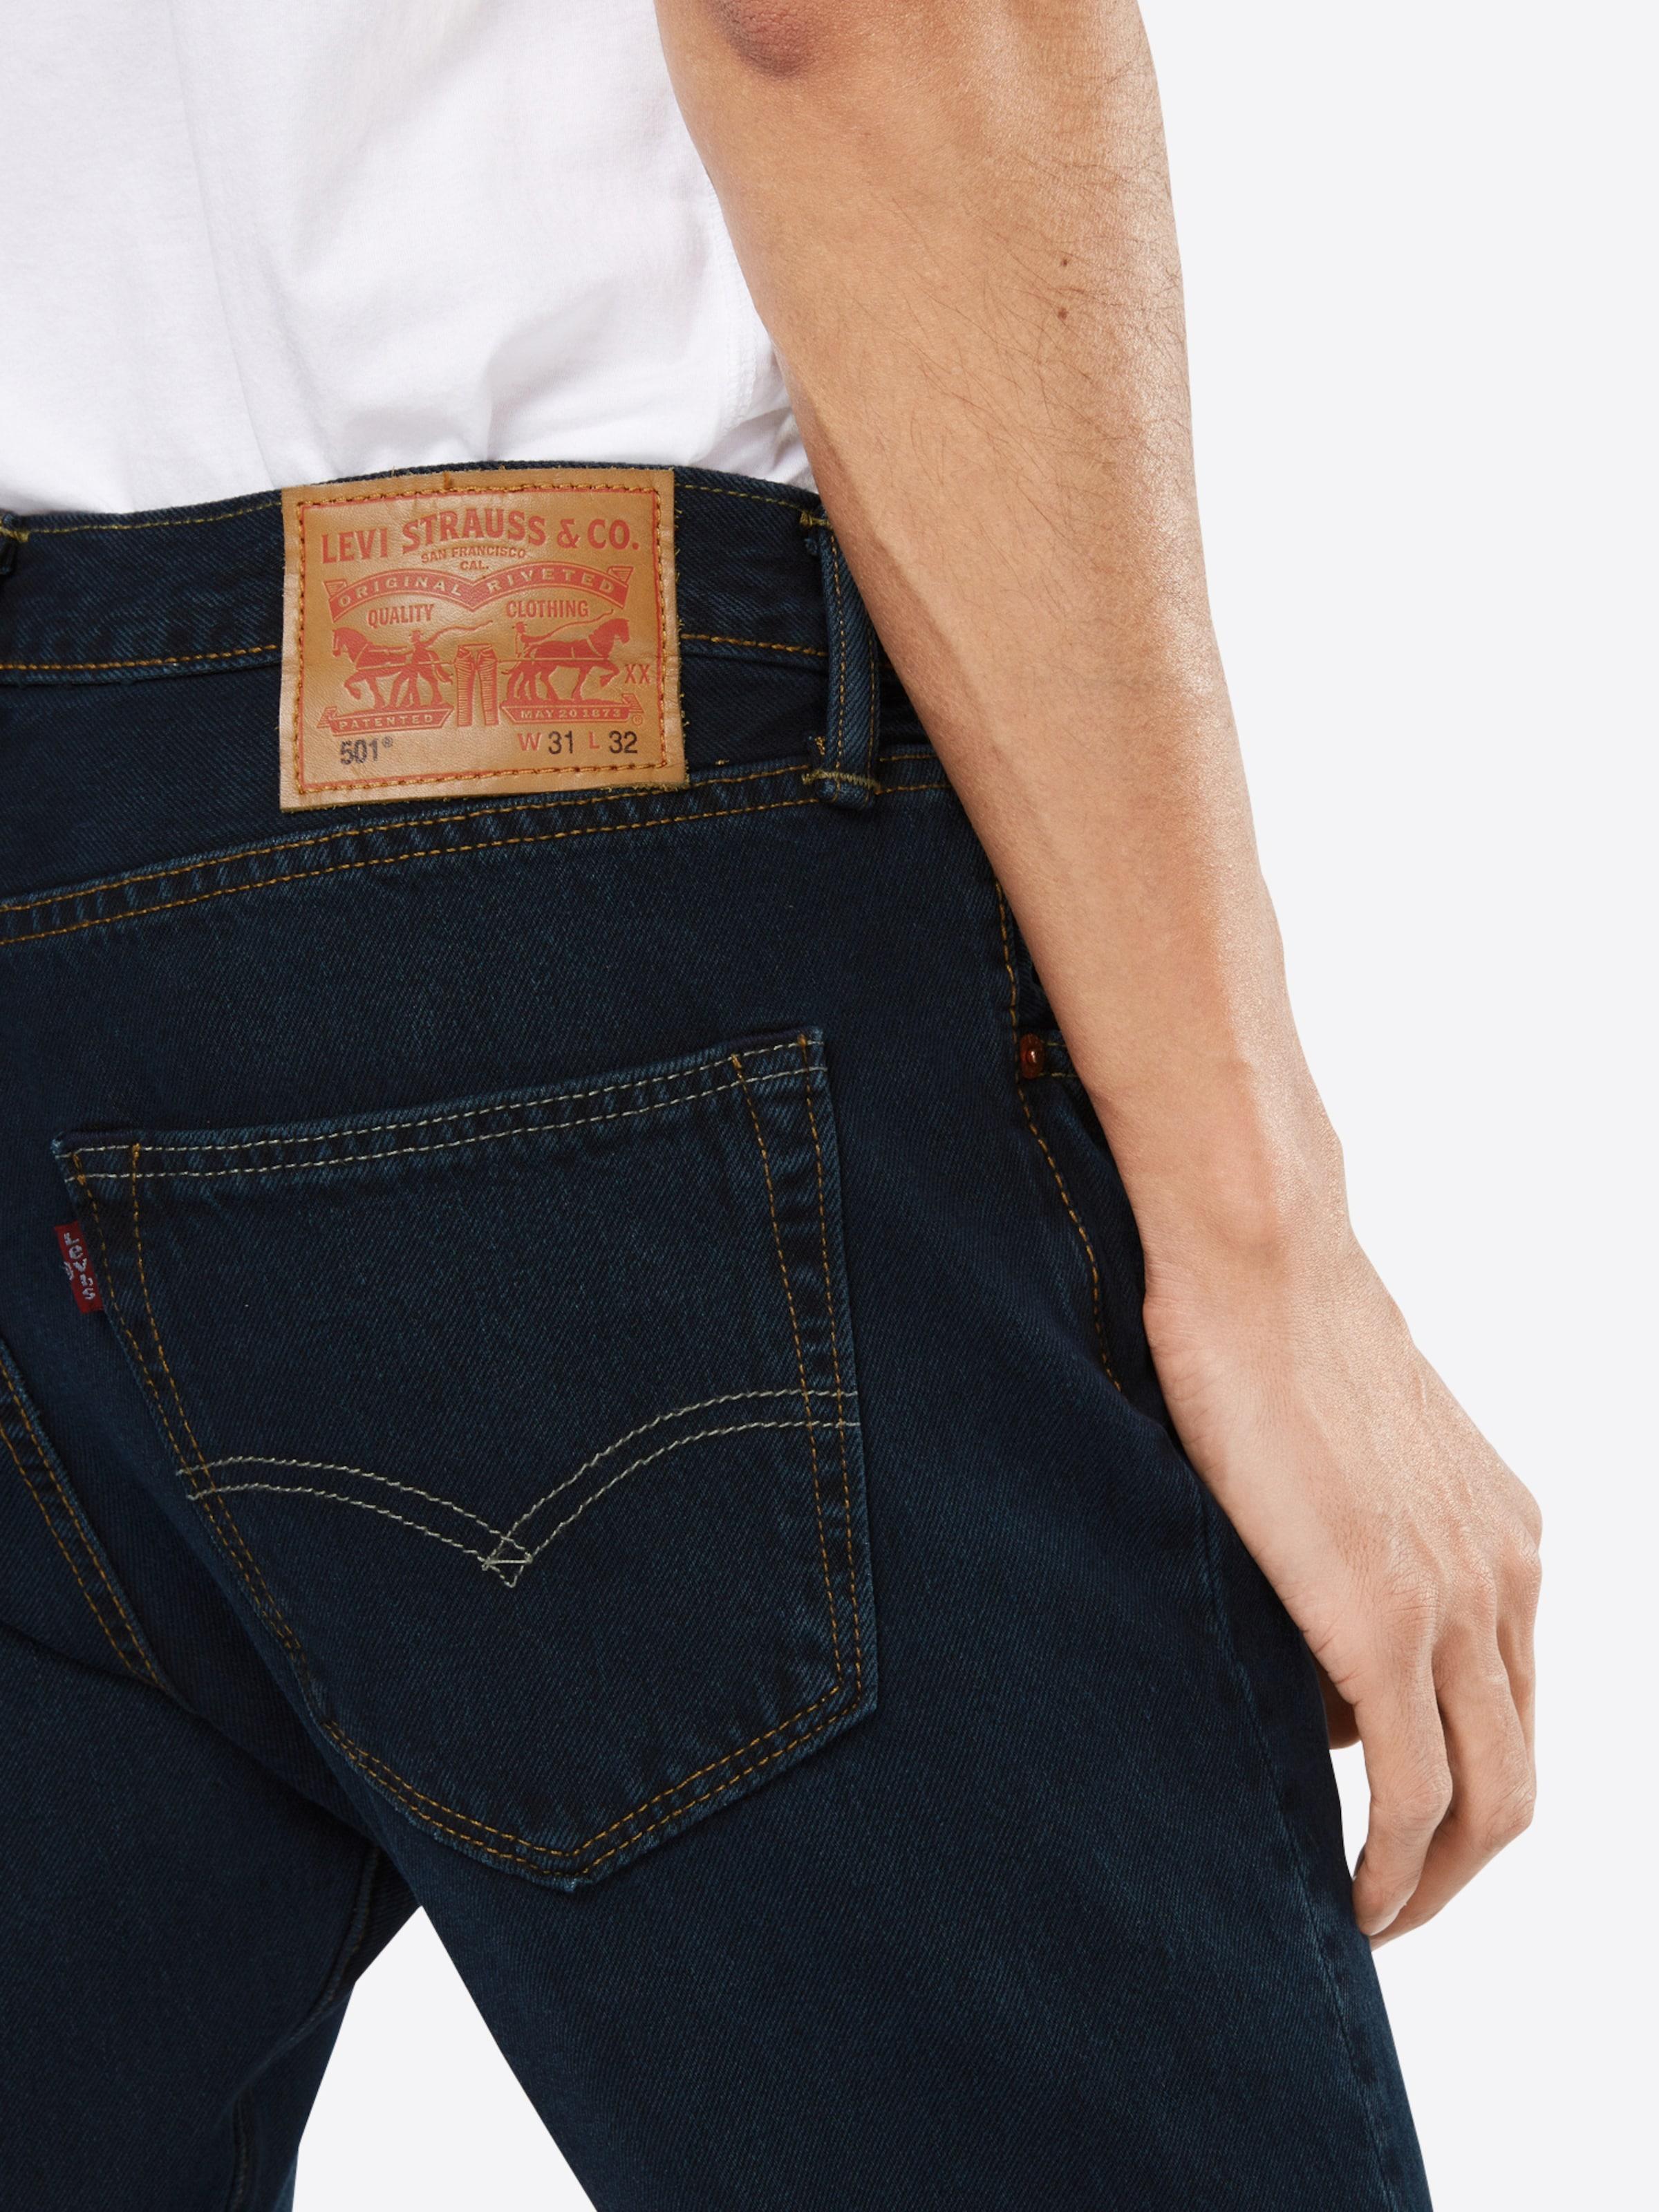 LEVI'S Jeans '501 ORIGINAL FIT' Genießen Sie Online xh7S29O